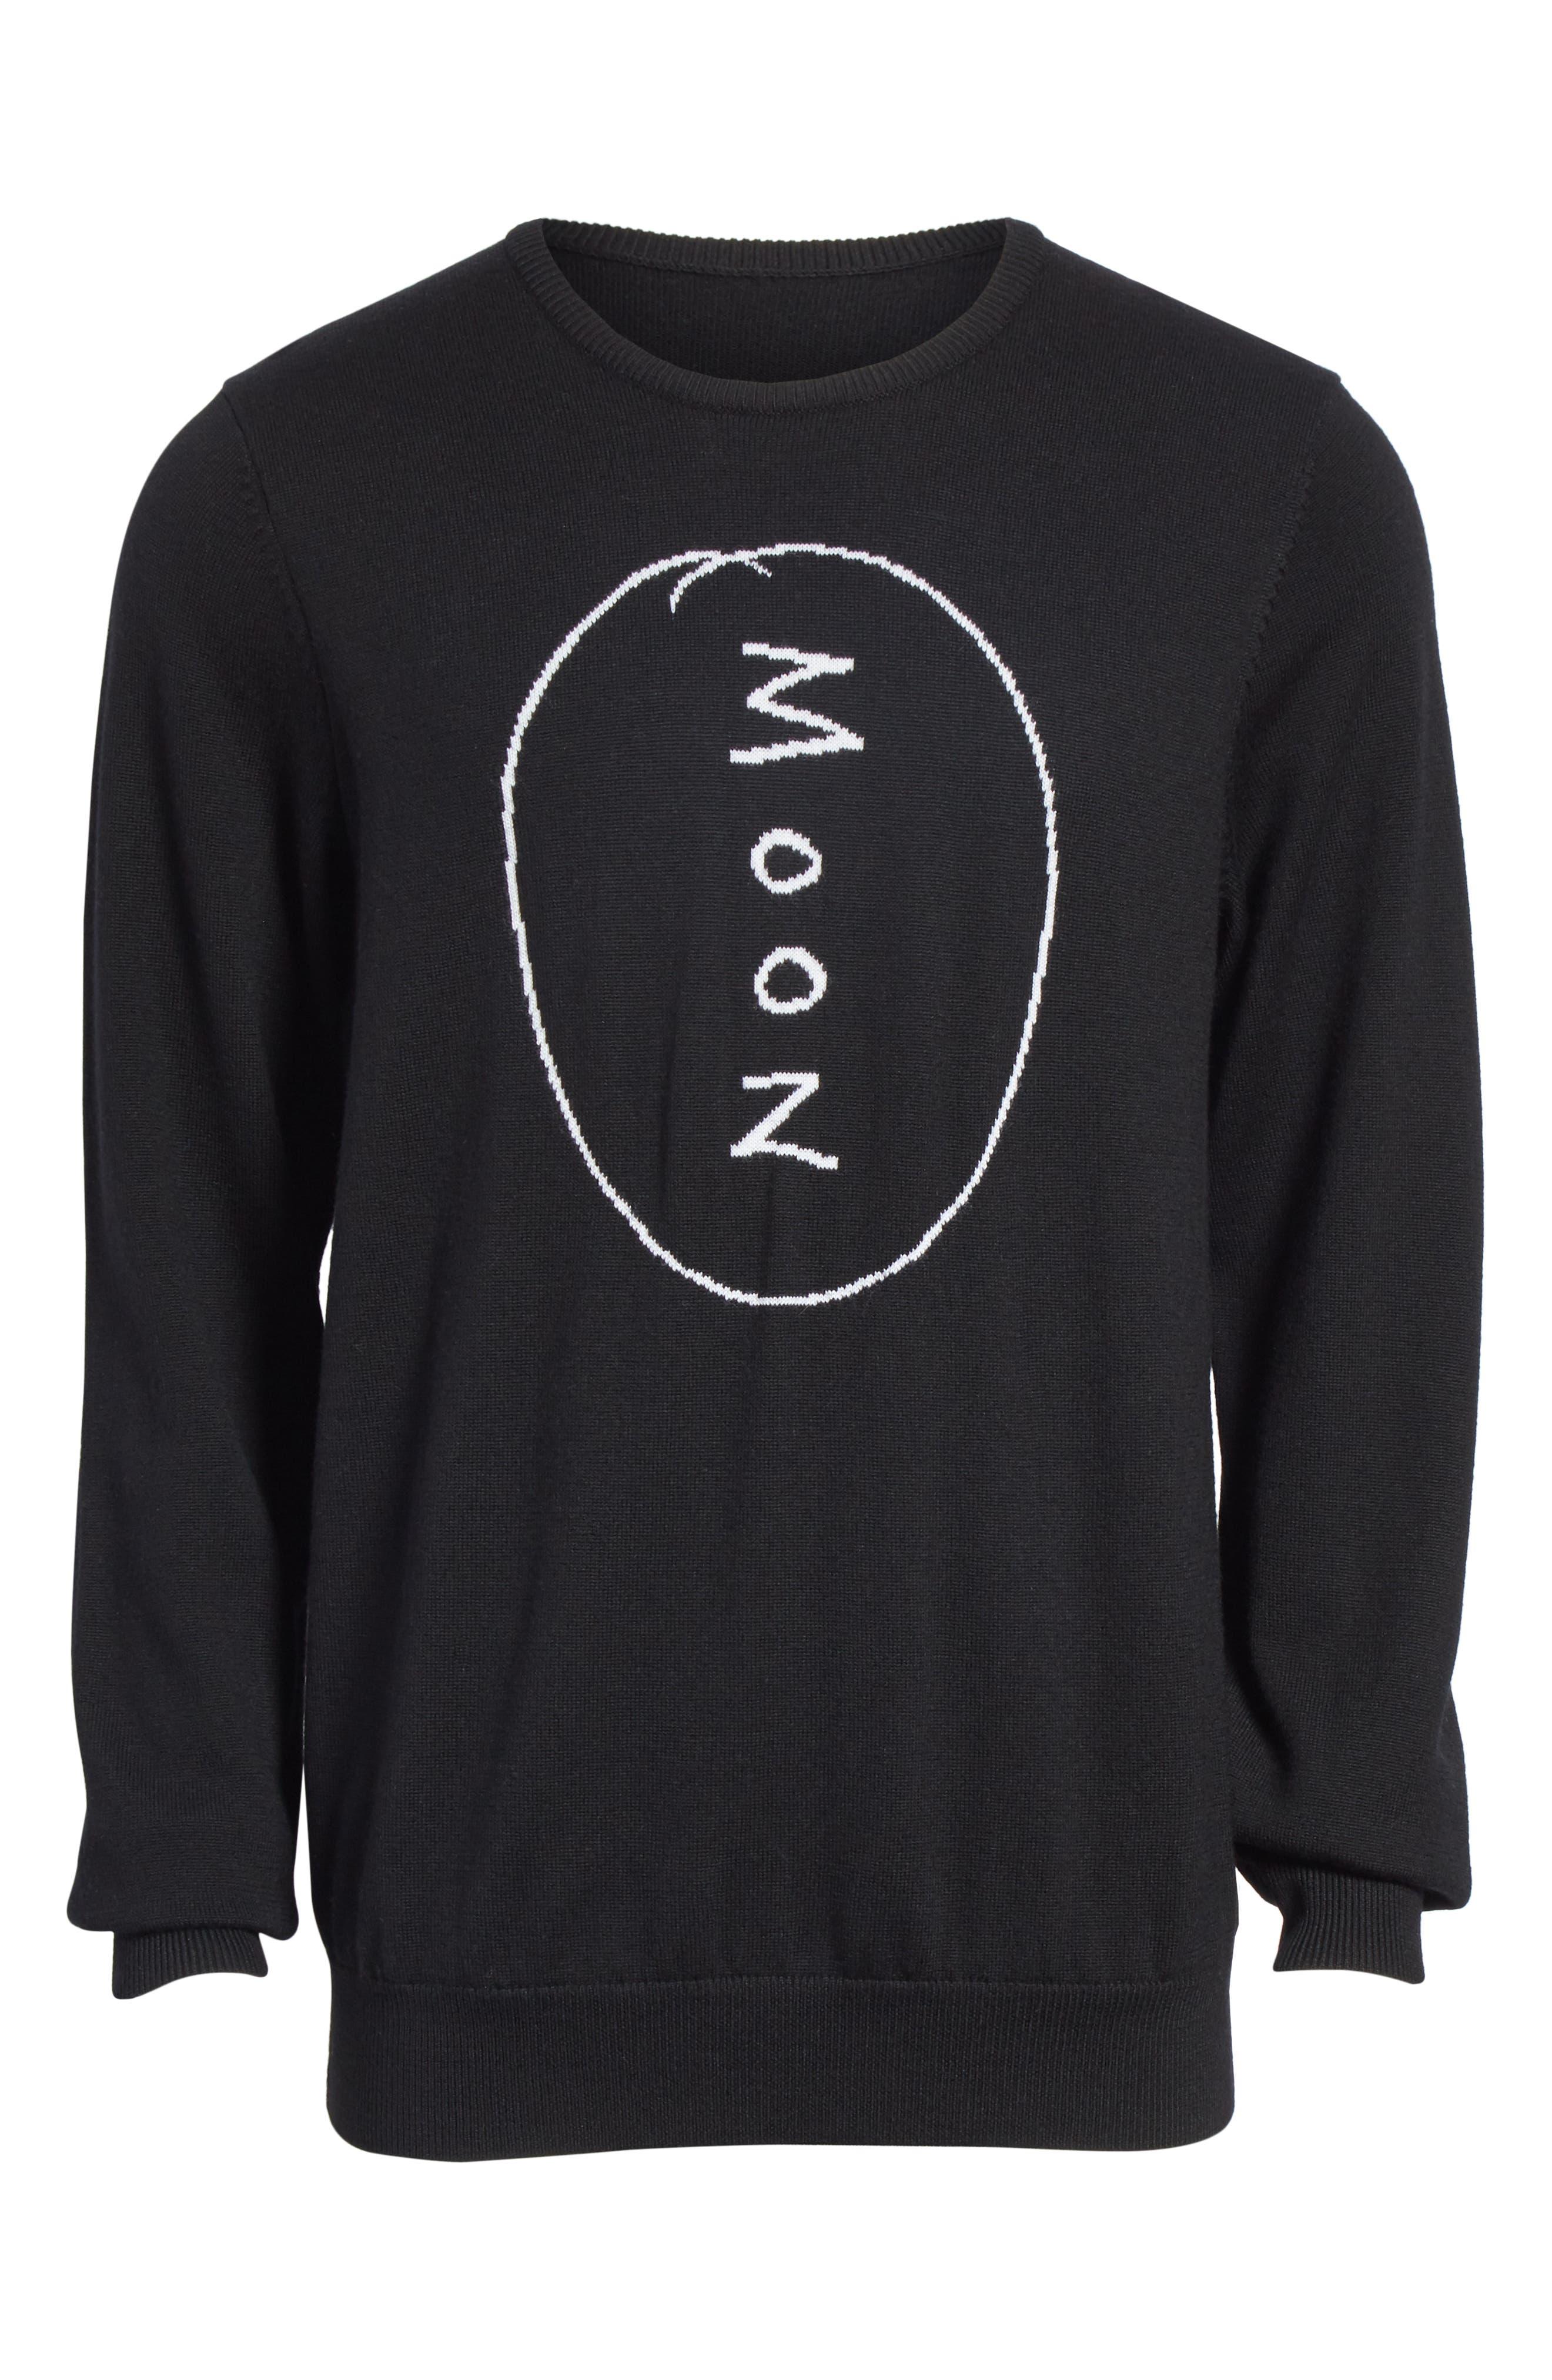 Moon Merino Wool Sweater,                             Alternate thumbnail 6, color,                             001